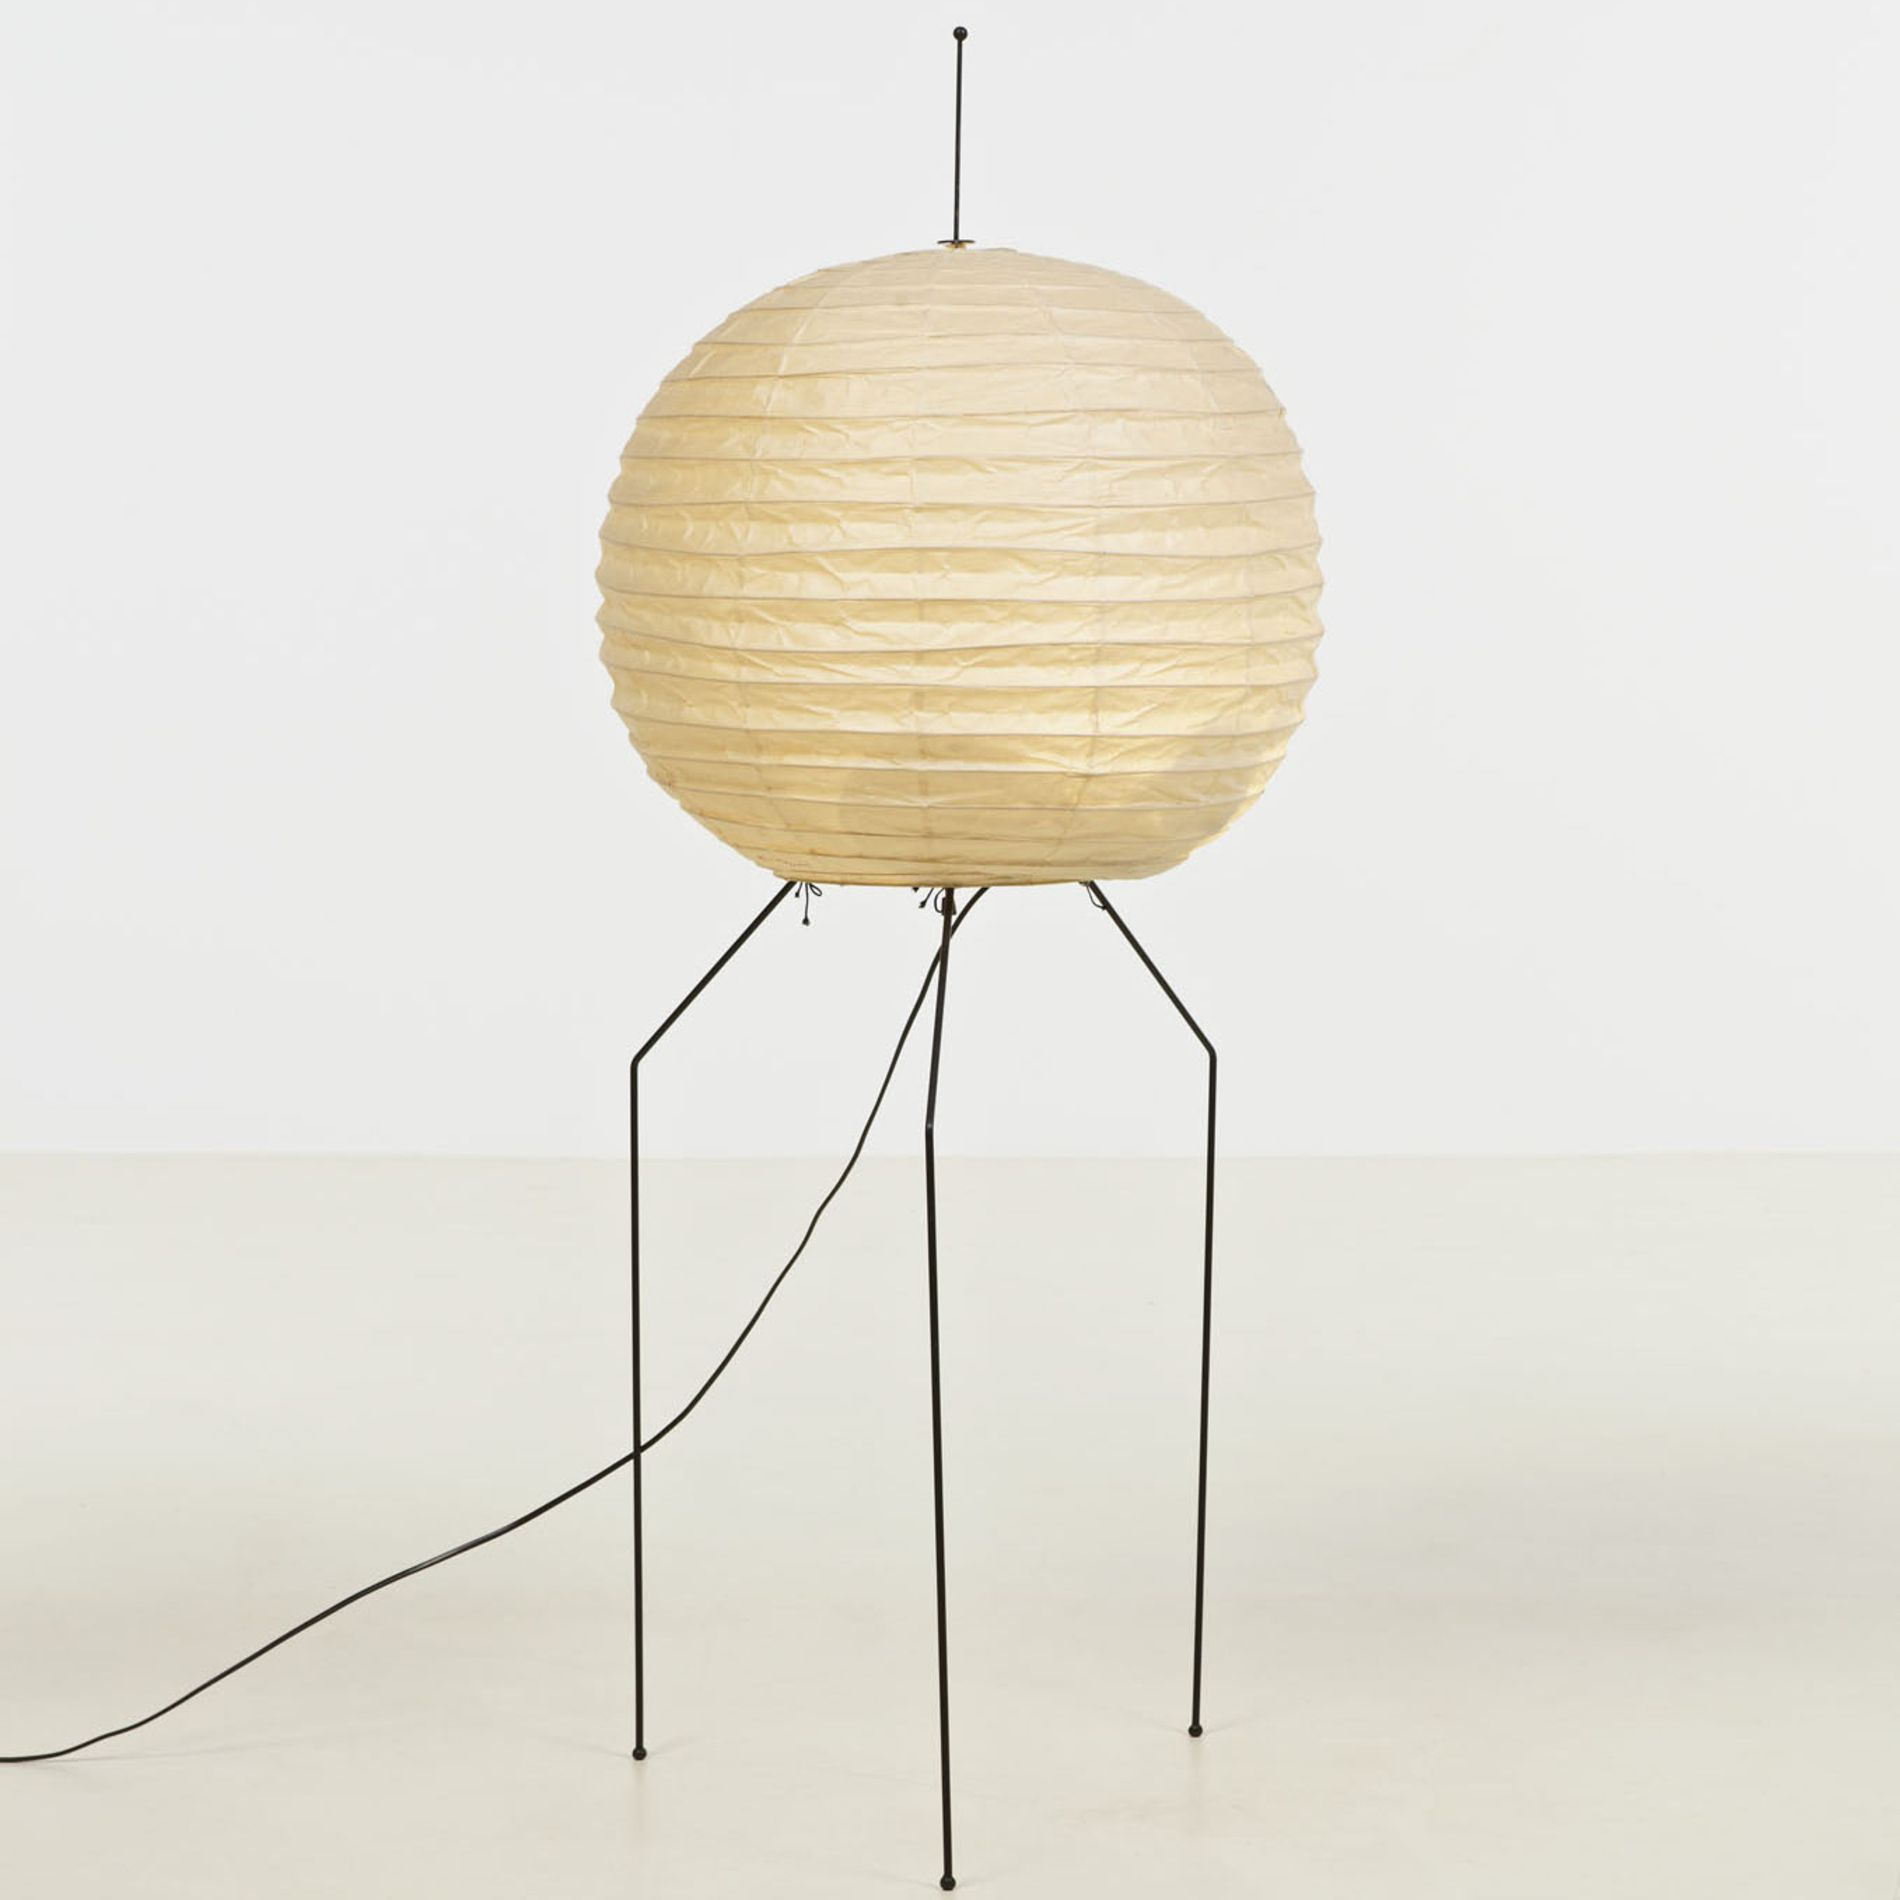 Isamu Noguchi; Metal, Washi Paper and Bamboo 'Akari' Floor Lamp, c1951.